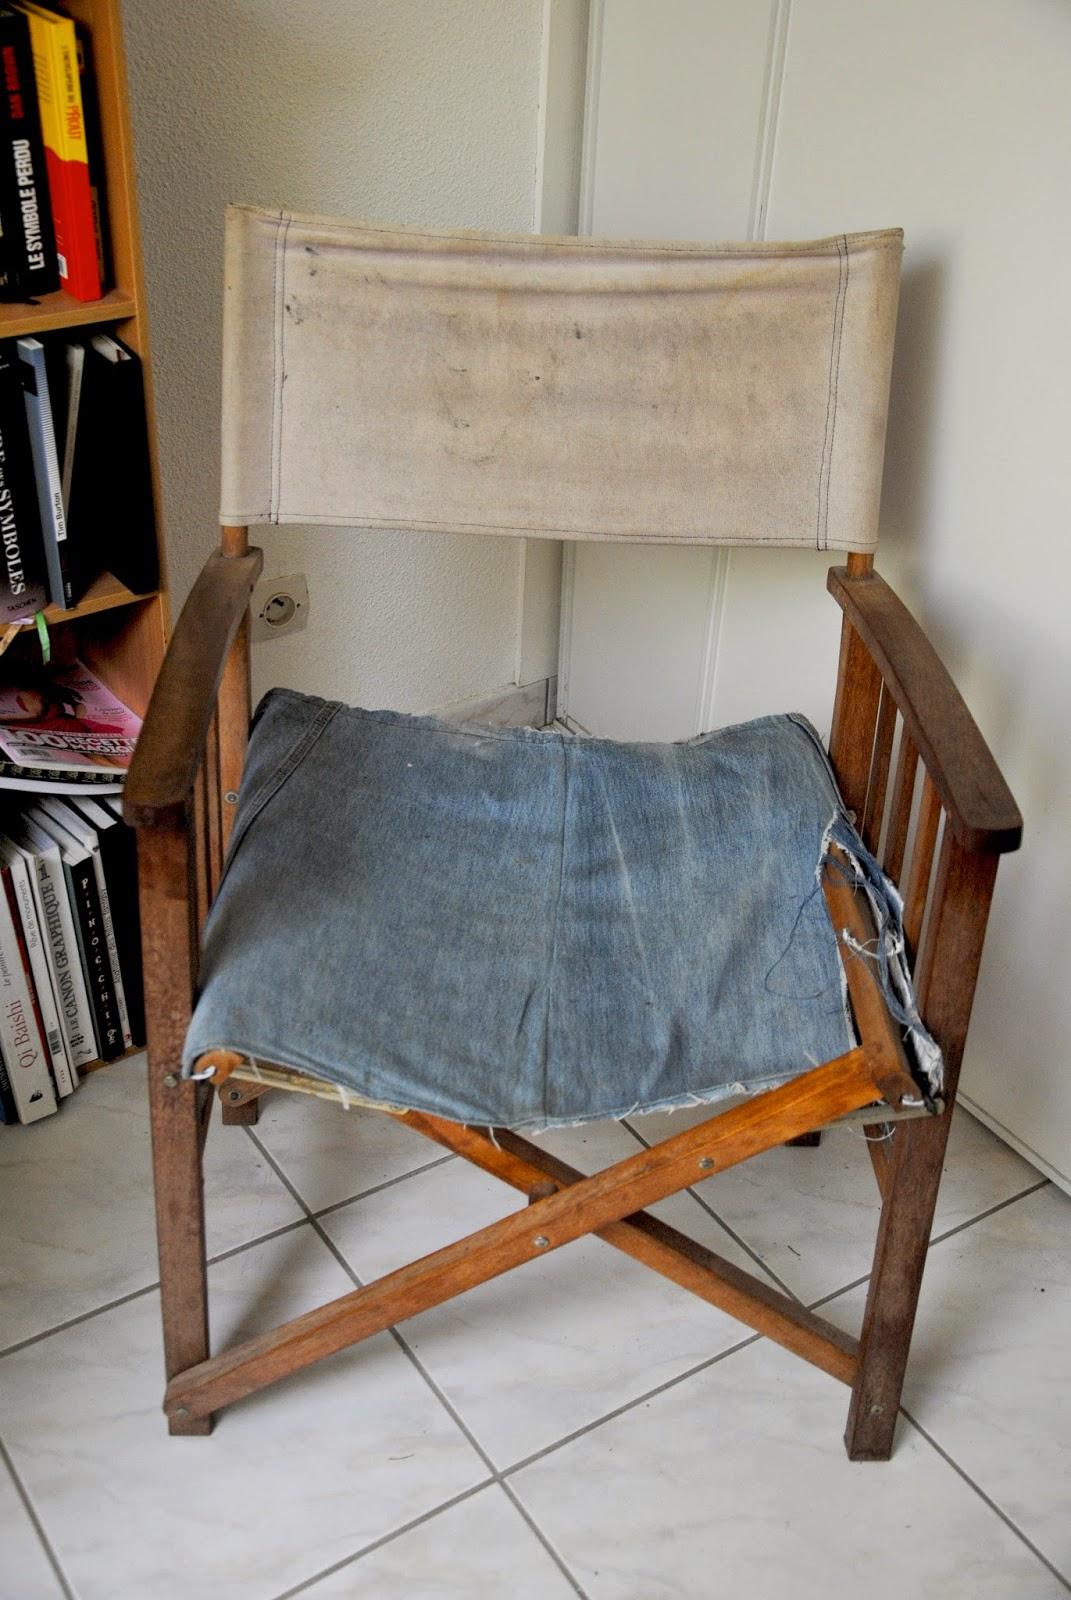 c line sew diy 4 relooker un fauteuil. Black Bedroom Furniture Sets. Home Design Ideas